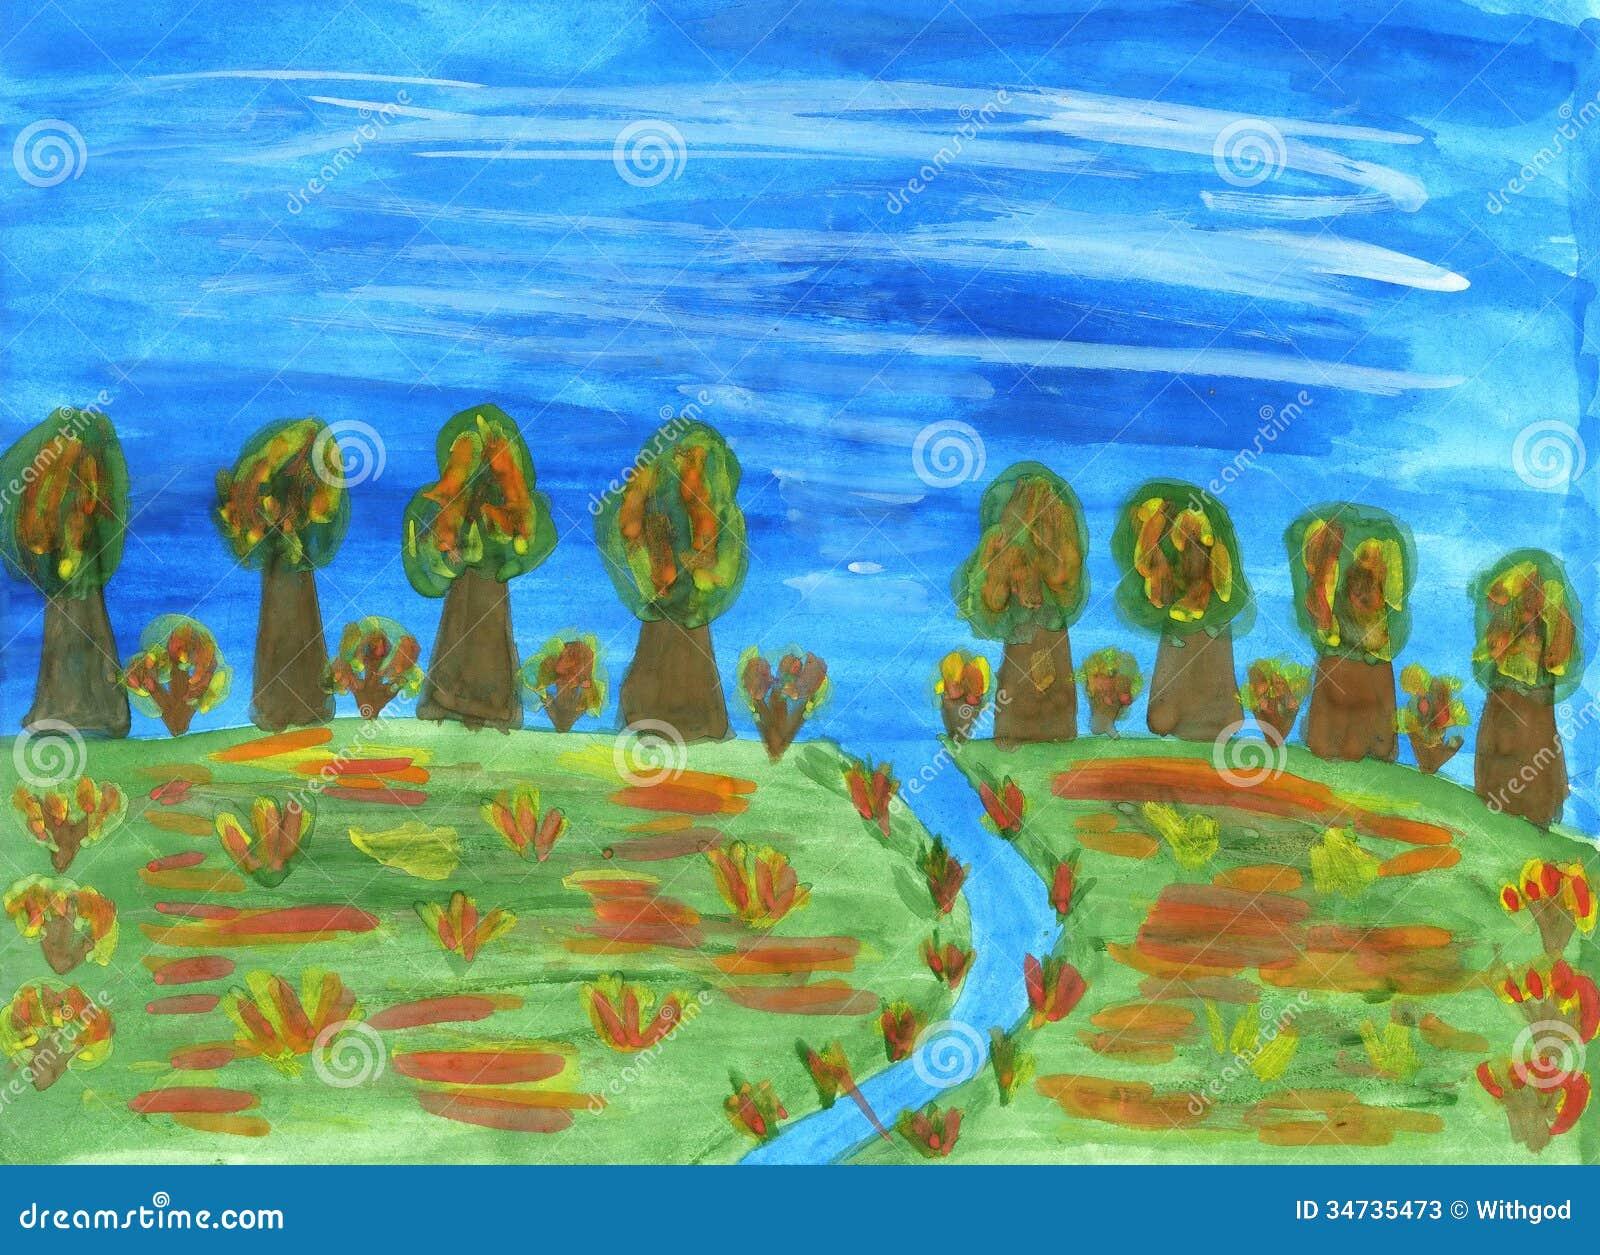 Paysage d 39 automne dessin d 39 enfants image stock image du outdoors illustration 34735473 - Paysage d automne dessin ...